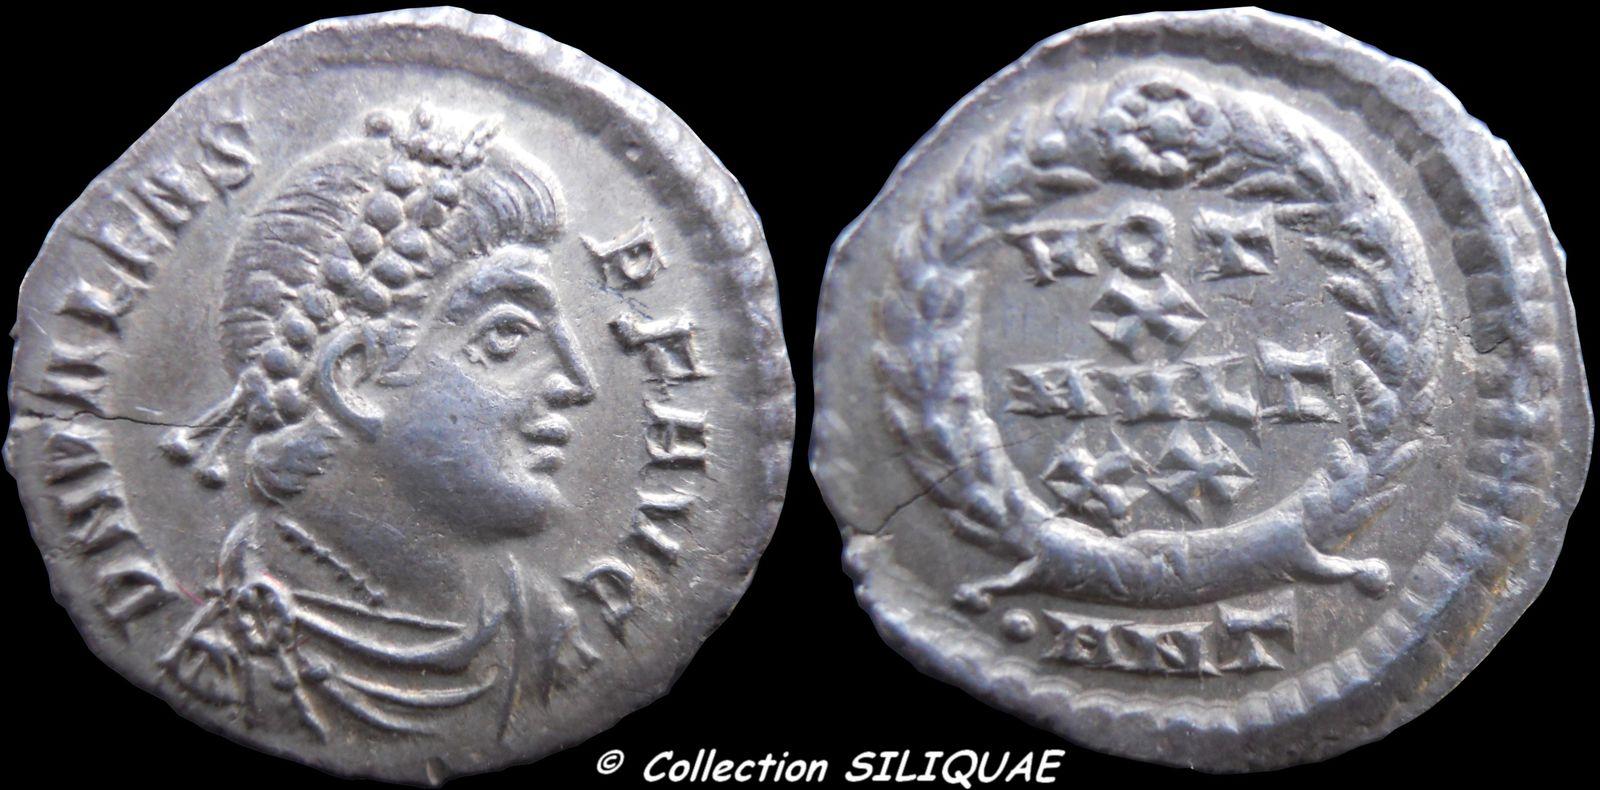 Collection Siliquae VALENS_RIC34b2